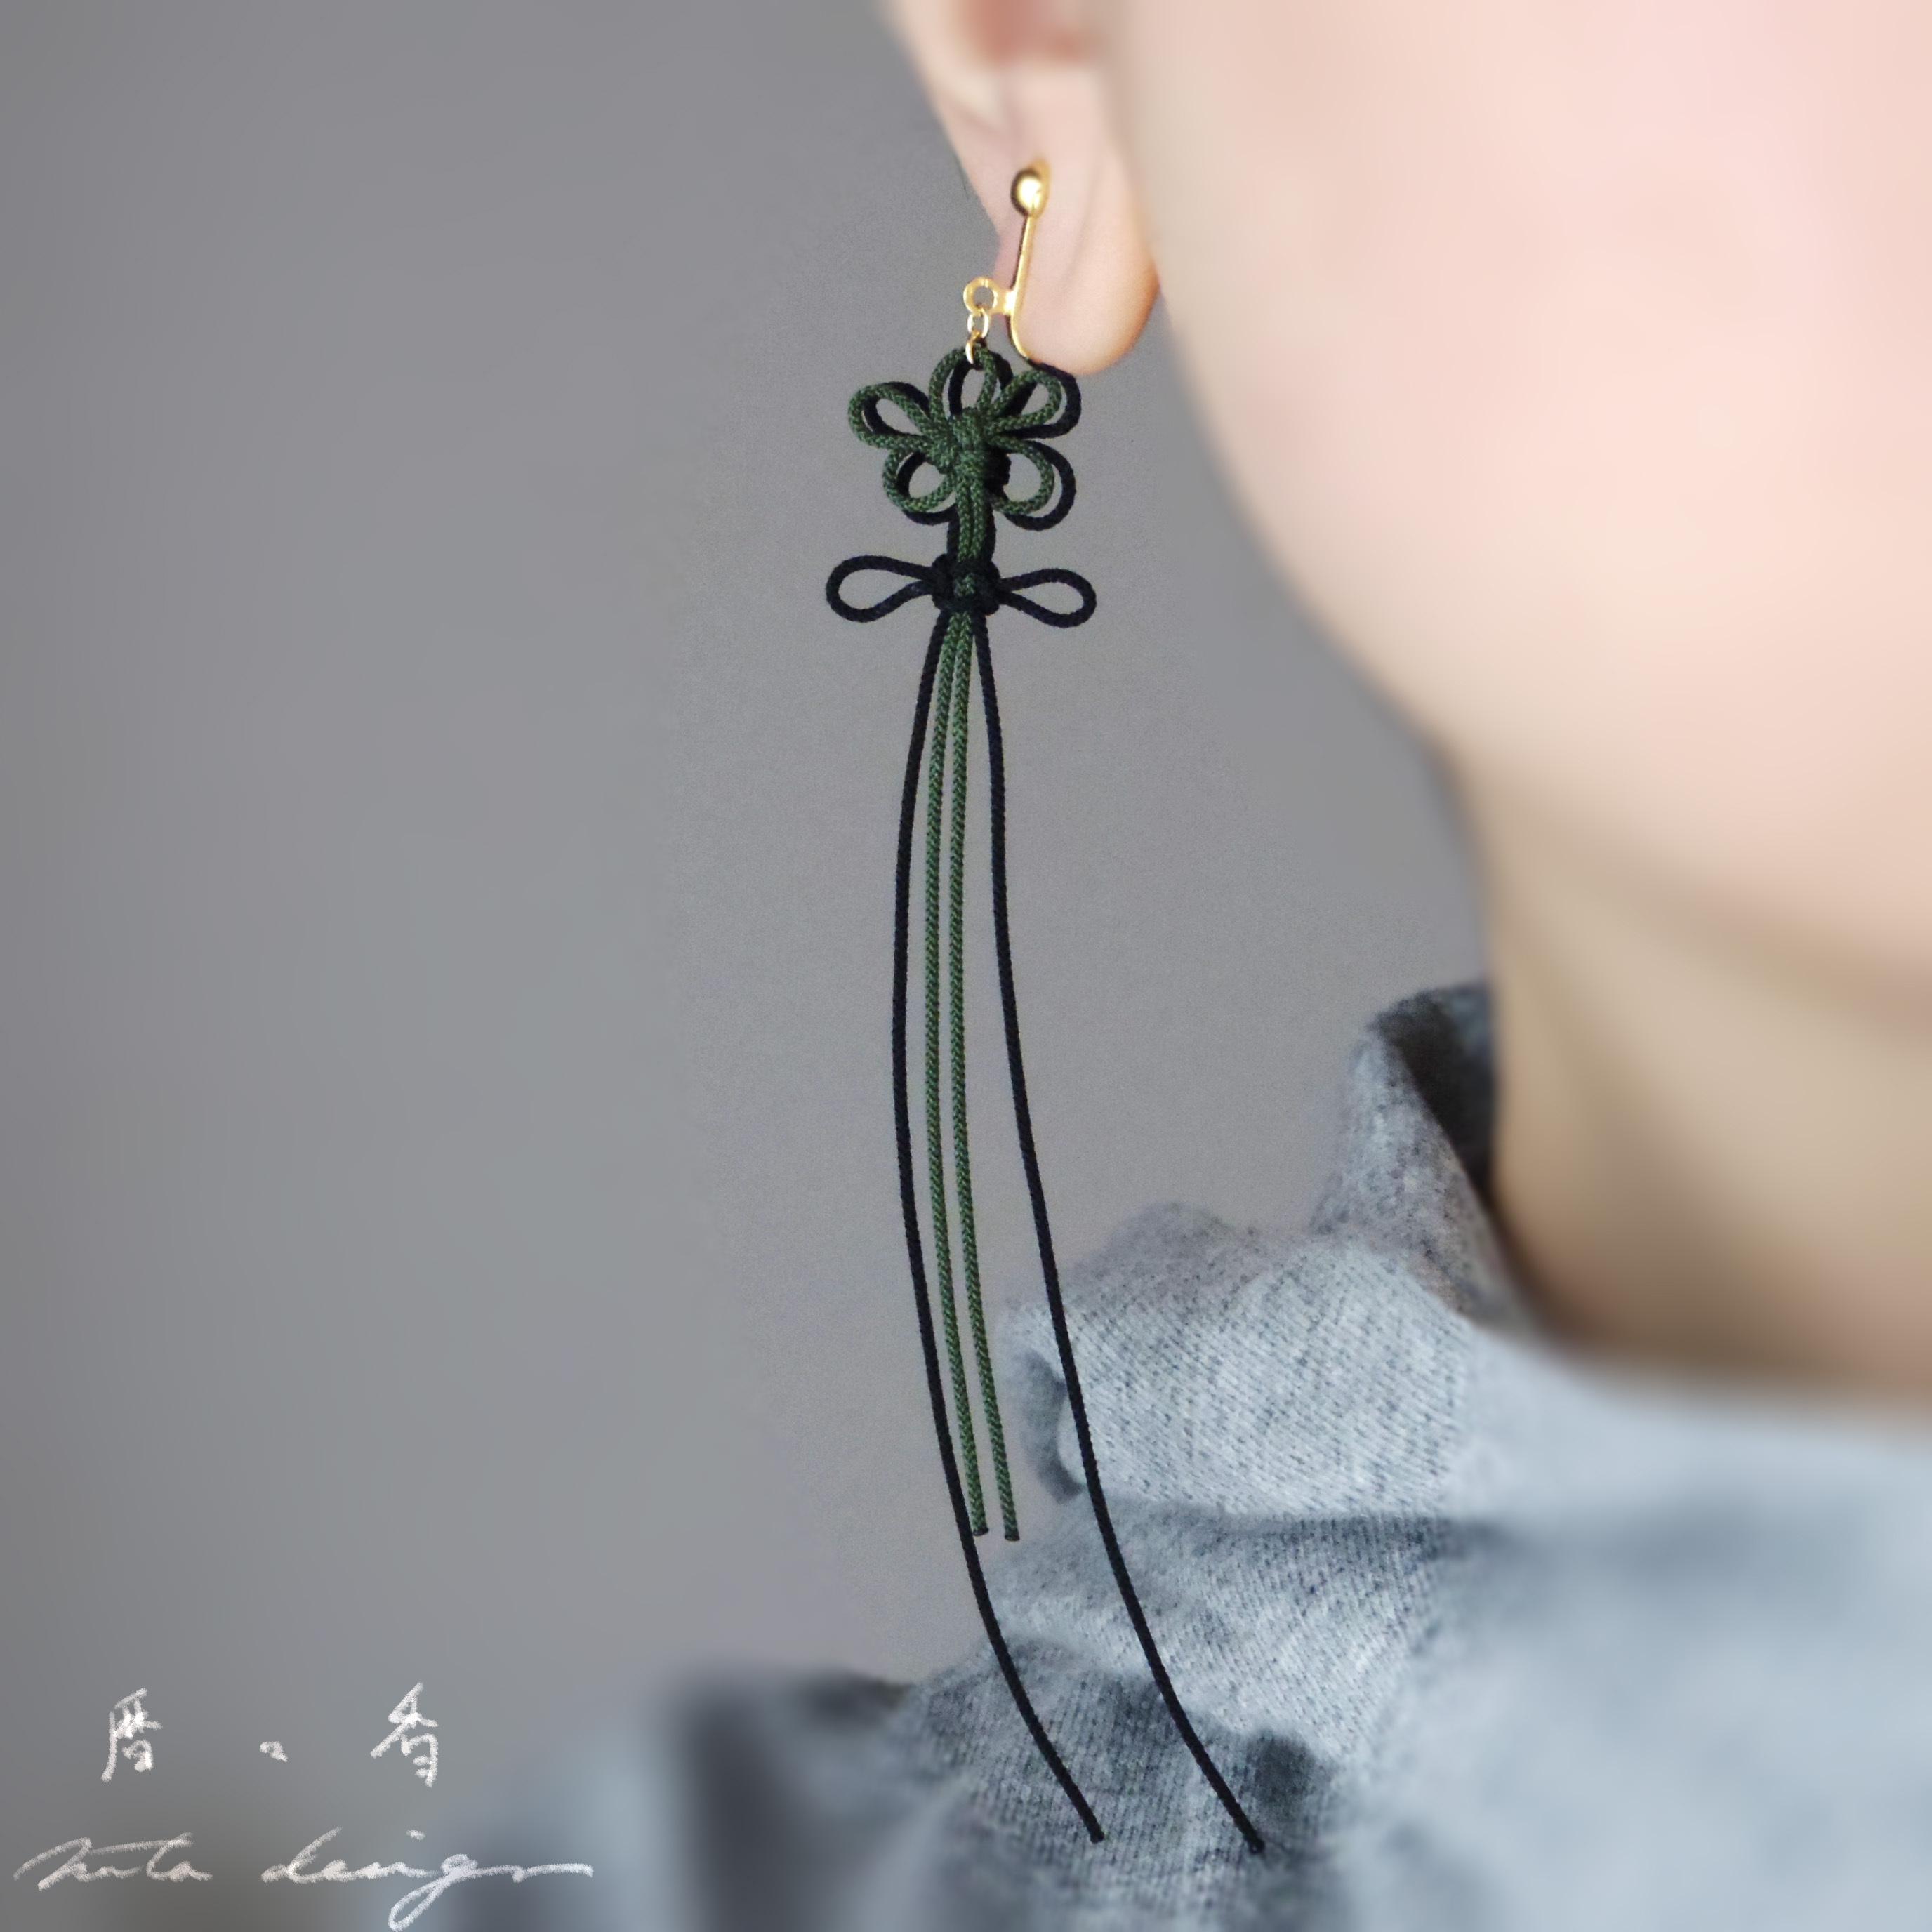 2021.9.14. up かたっぽピアス「暦々香」(深緑×黒)